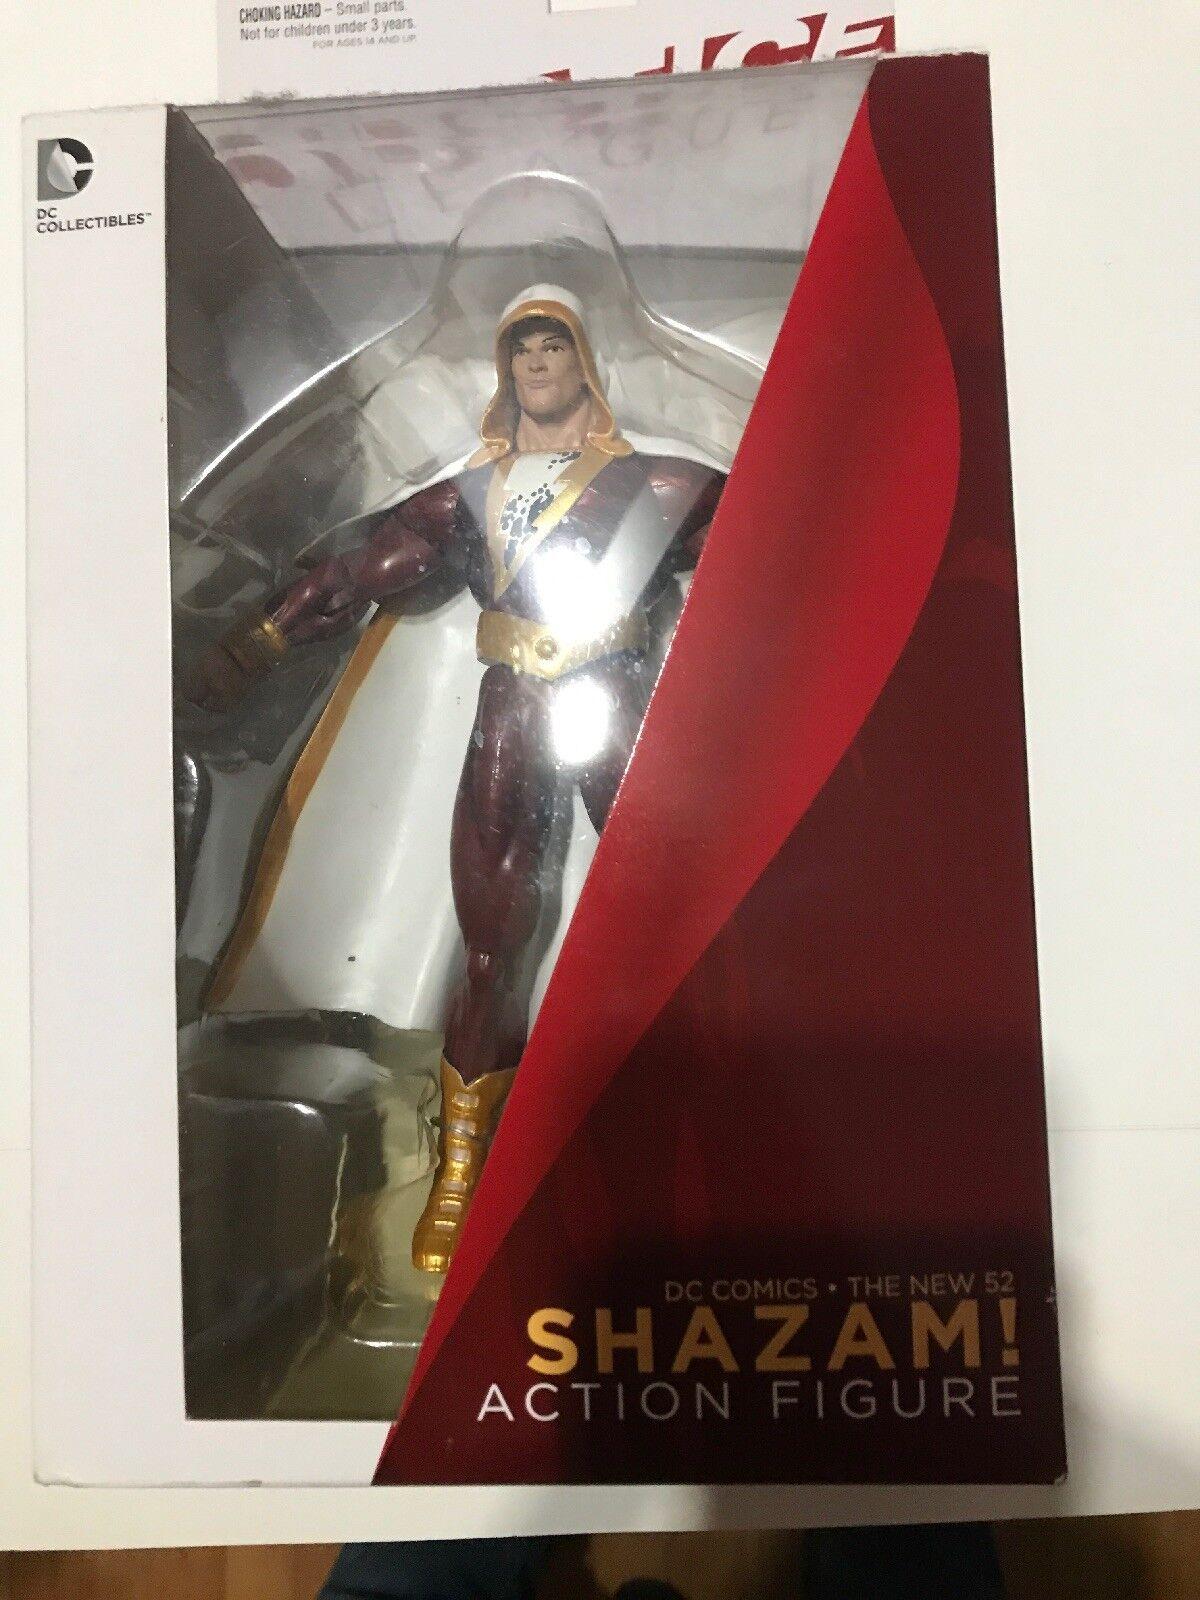 Dc comics and gerechtigkeitsliga  shazam action - figur